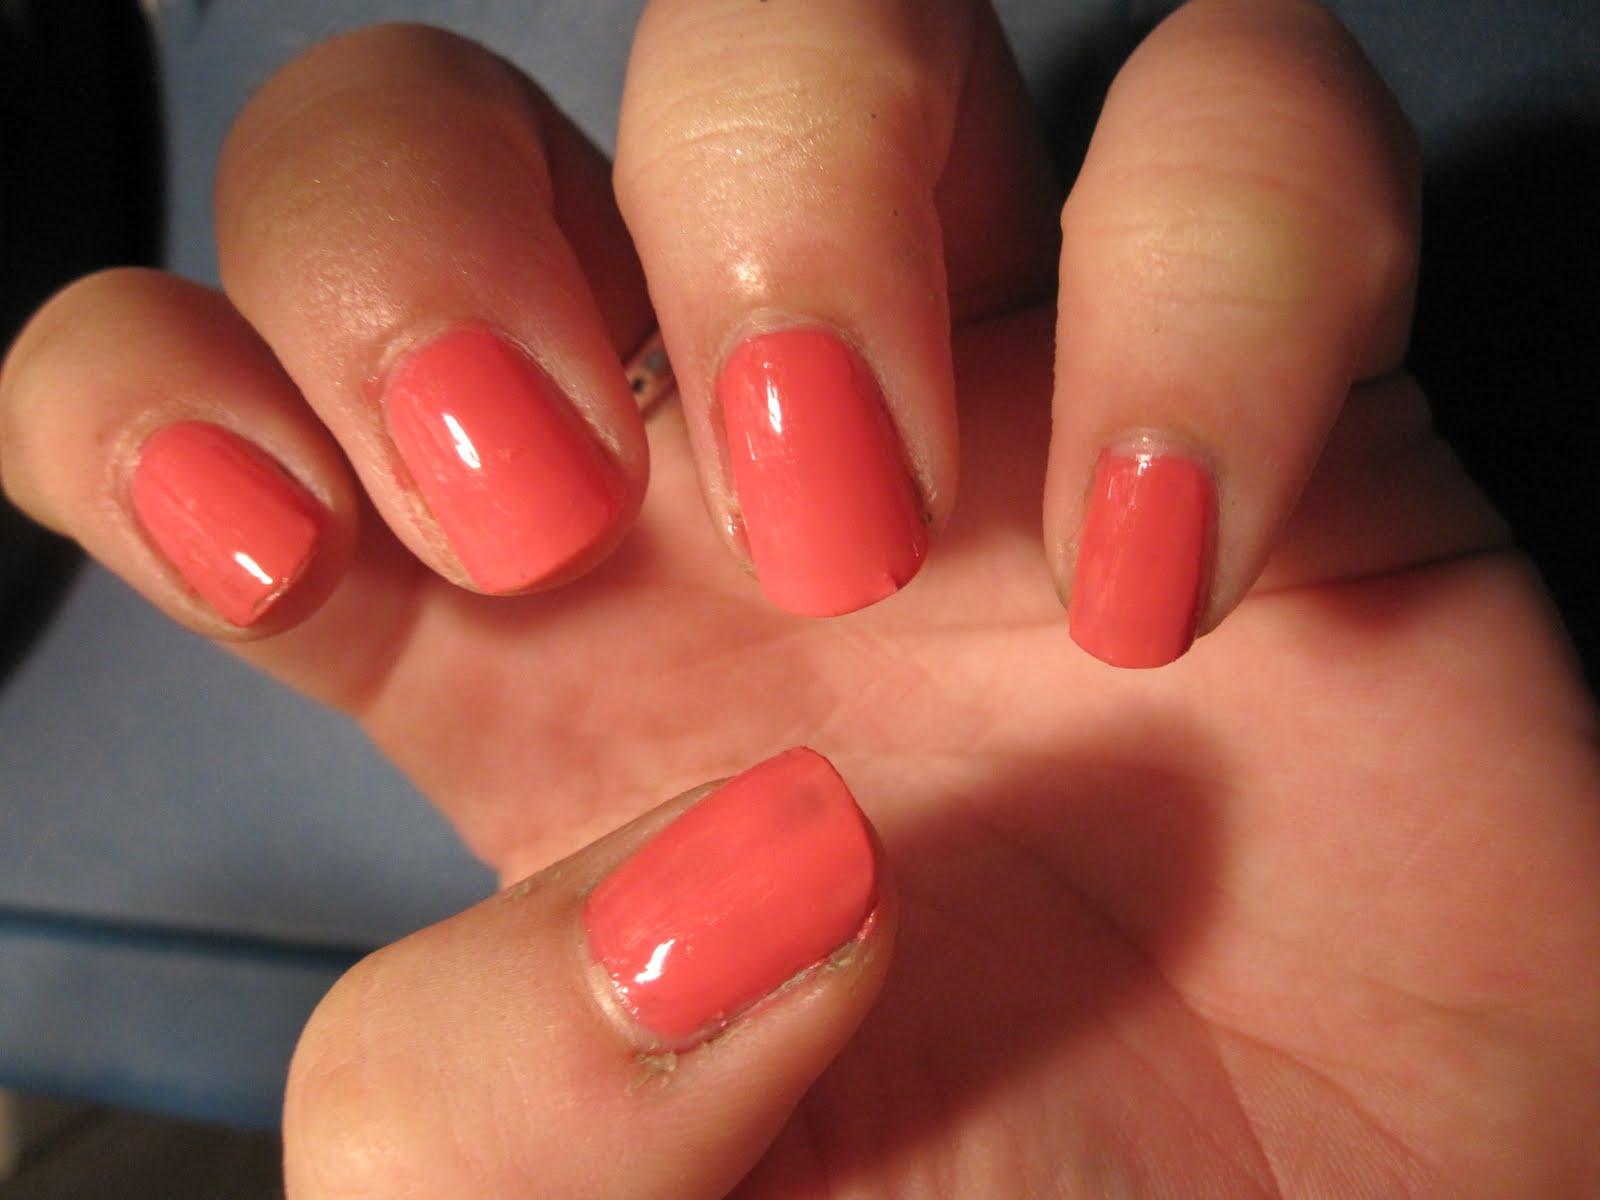 Big Apple Red Nails: Shrimply Devine